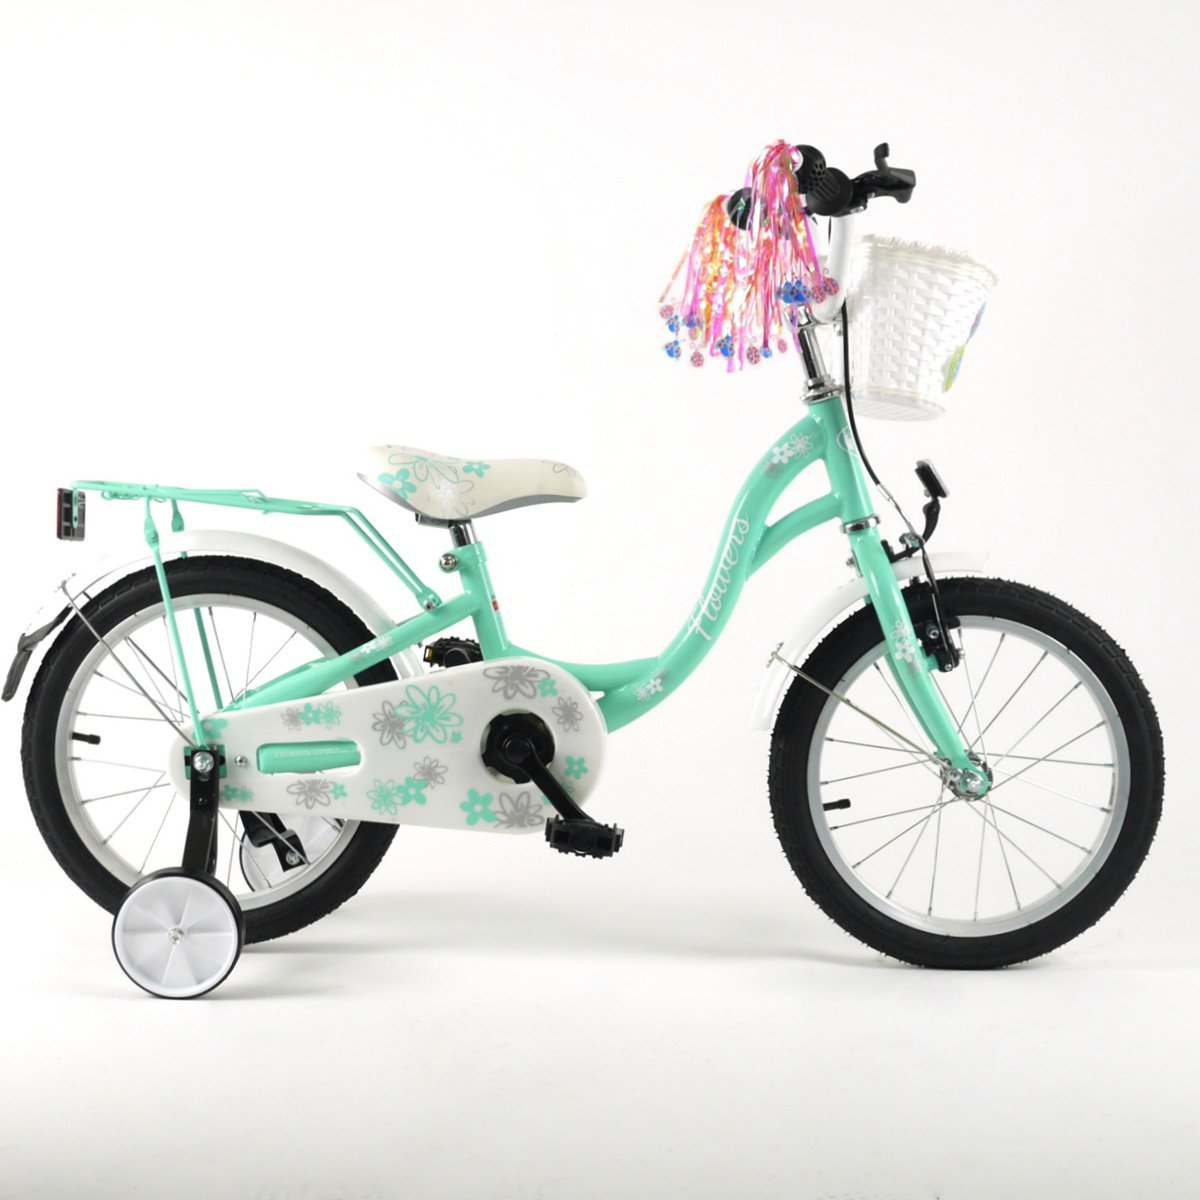 "16FLO-CYA Kinderfahrrad 16"" Zoll Kinderrad Fahrrad Spielrad Rad Bike Kinder"